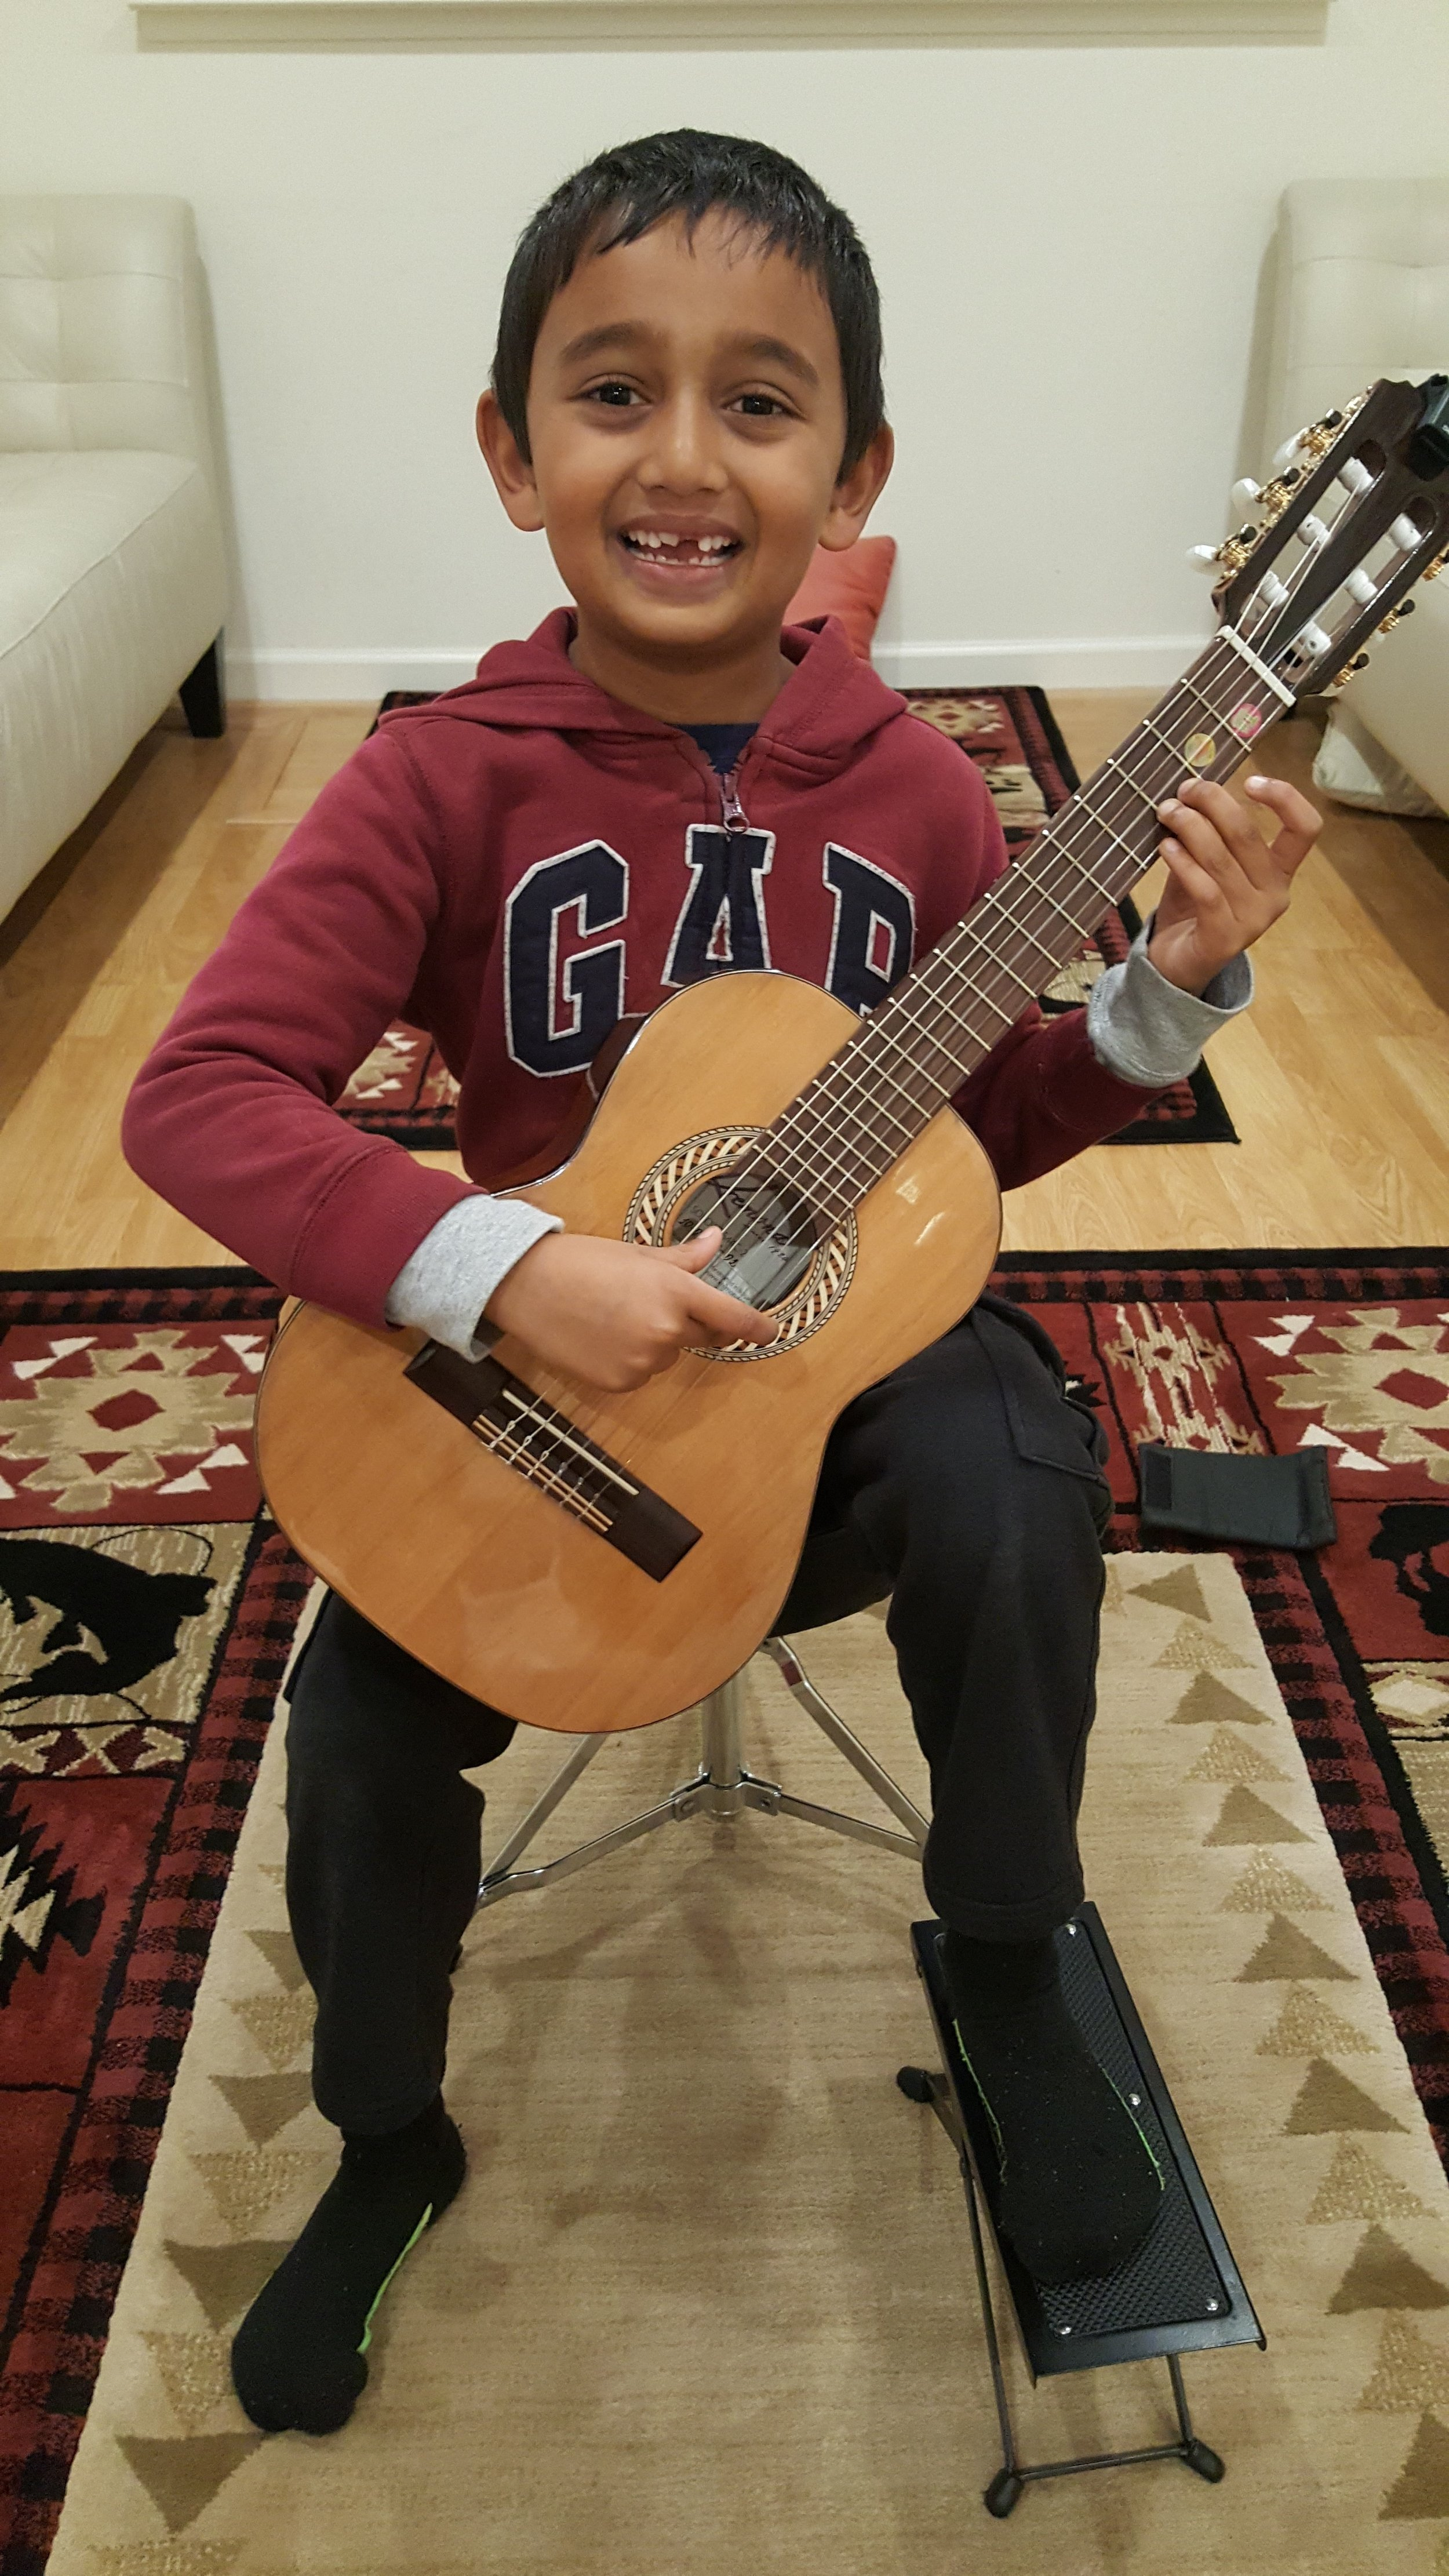 arjun playing guitar CCM